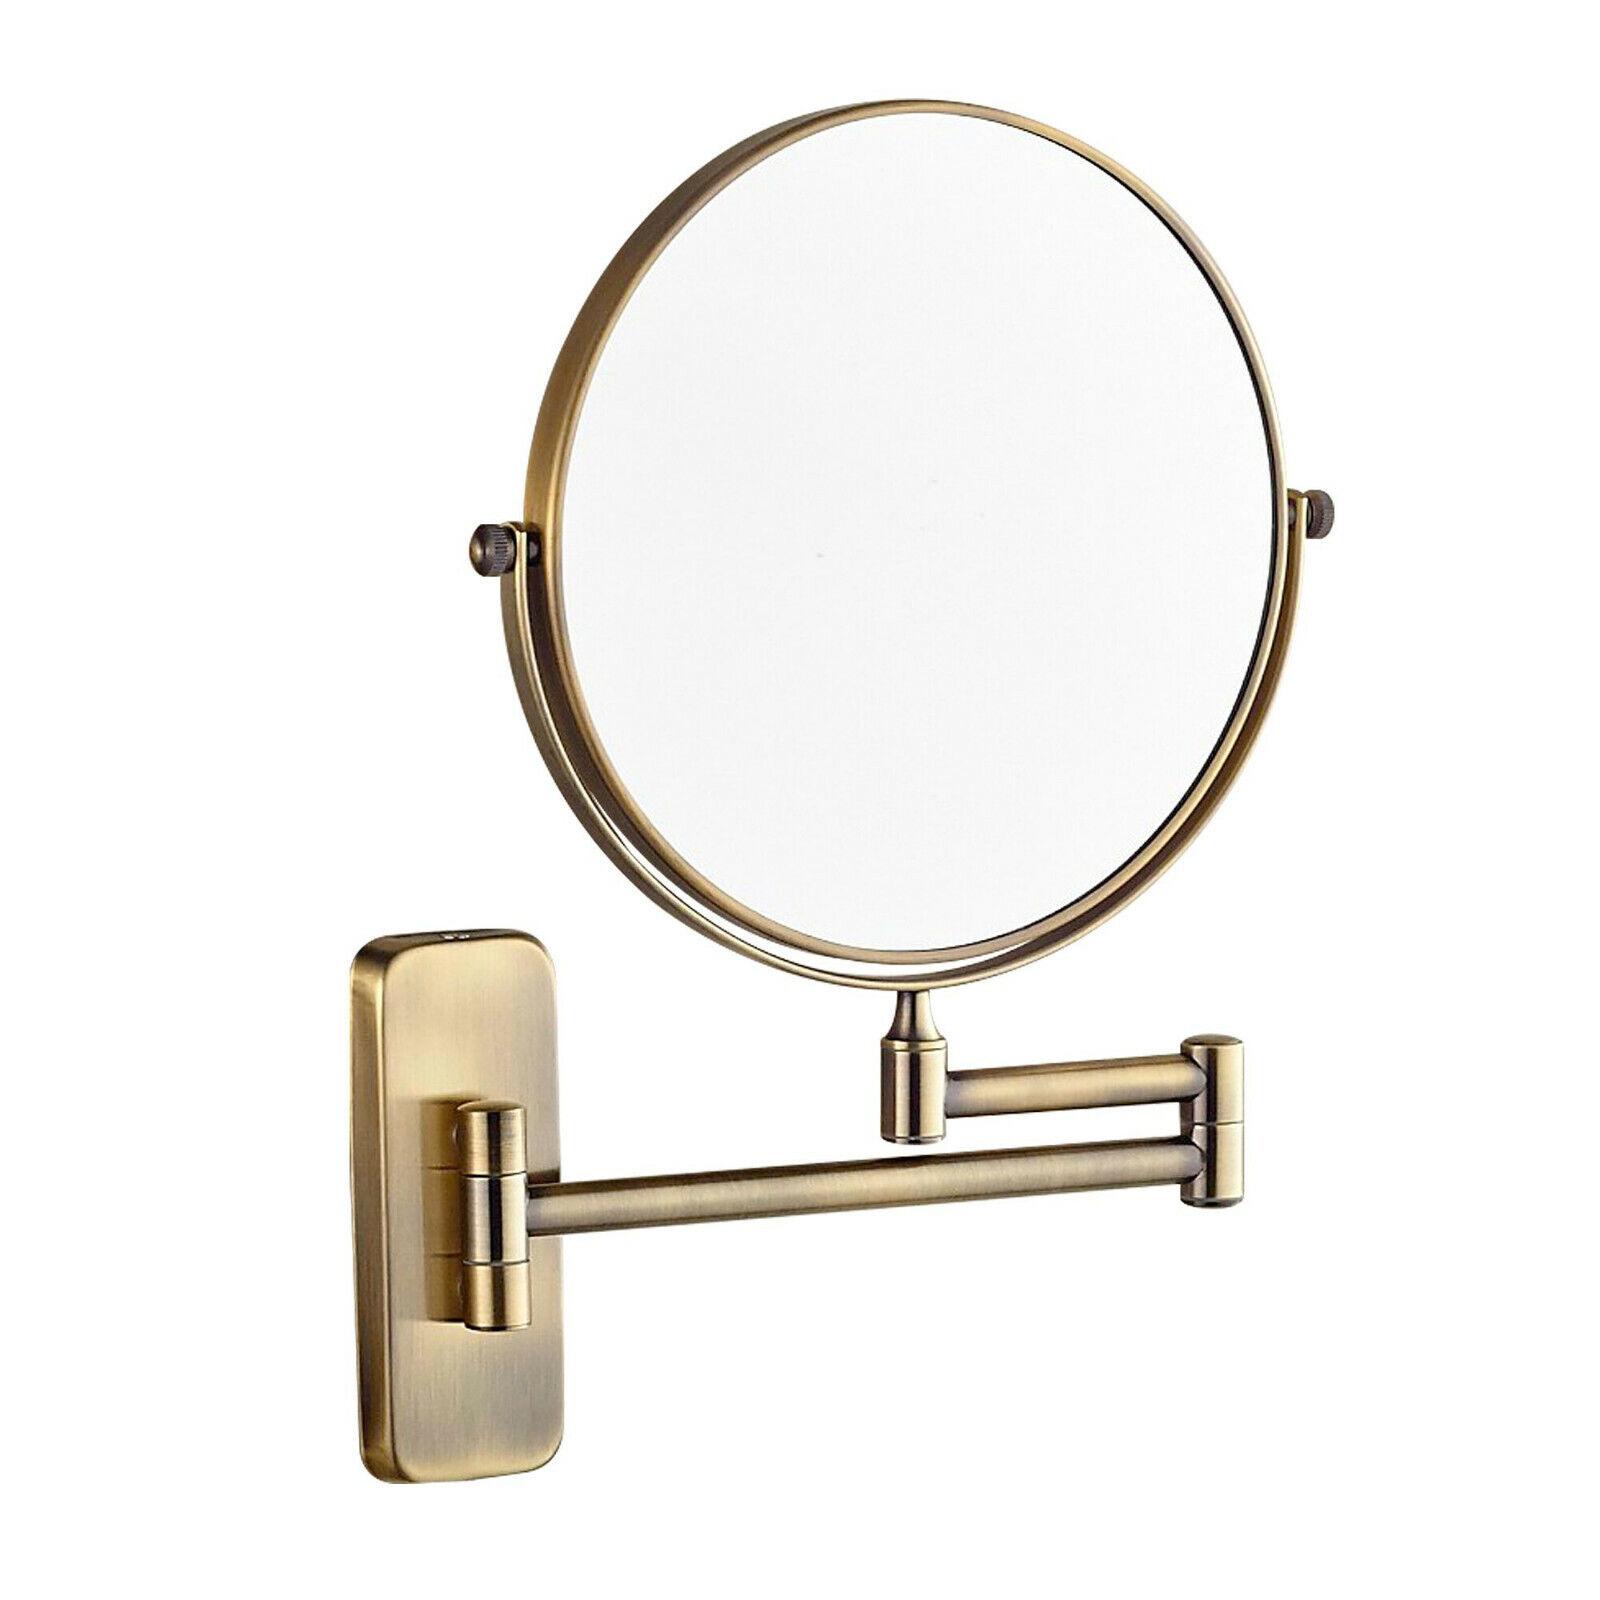 GURUN 10X Magnifying Bathroom Swivel Makeup Mirrors Wall Mou